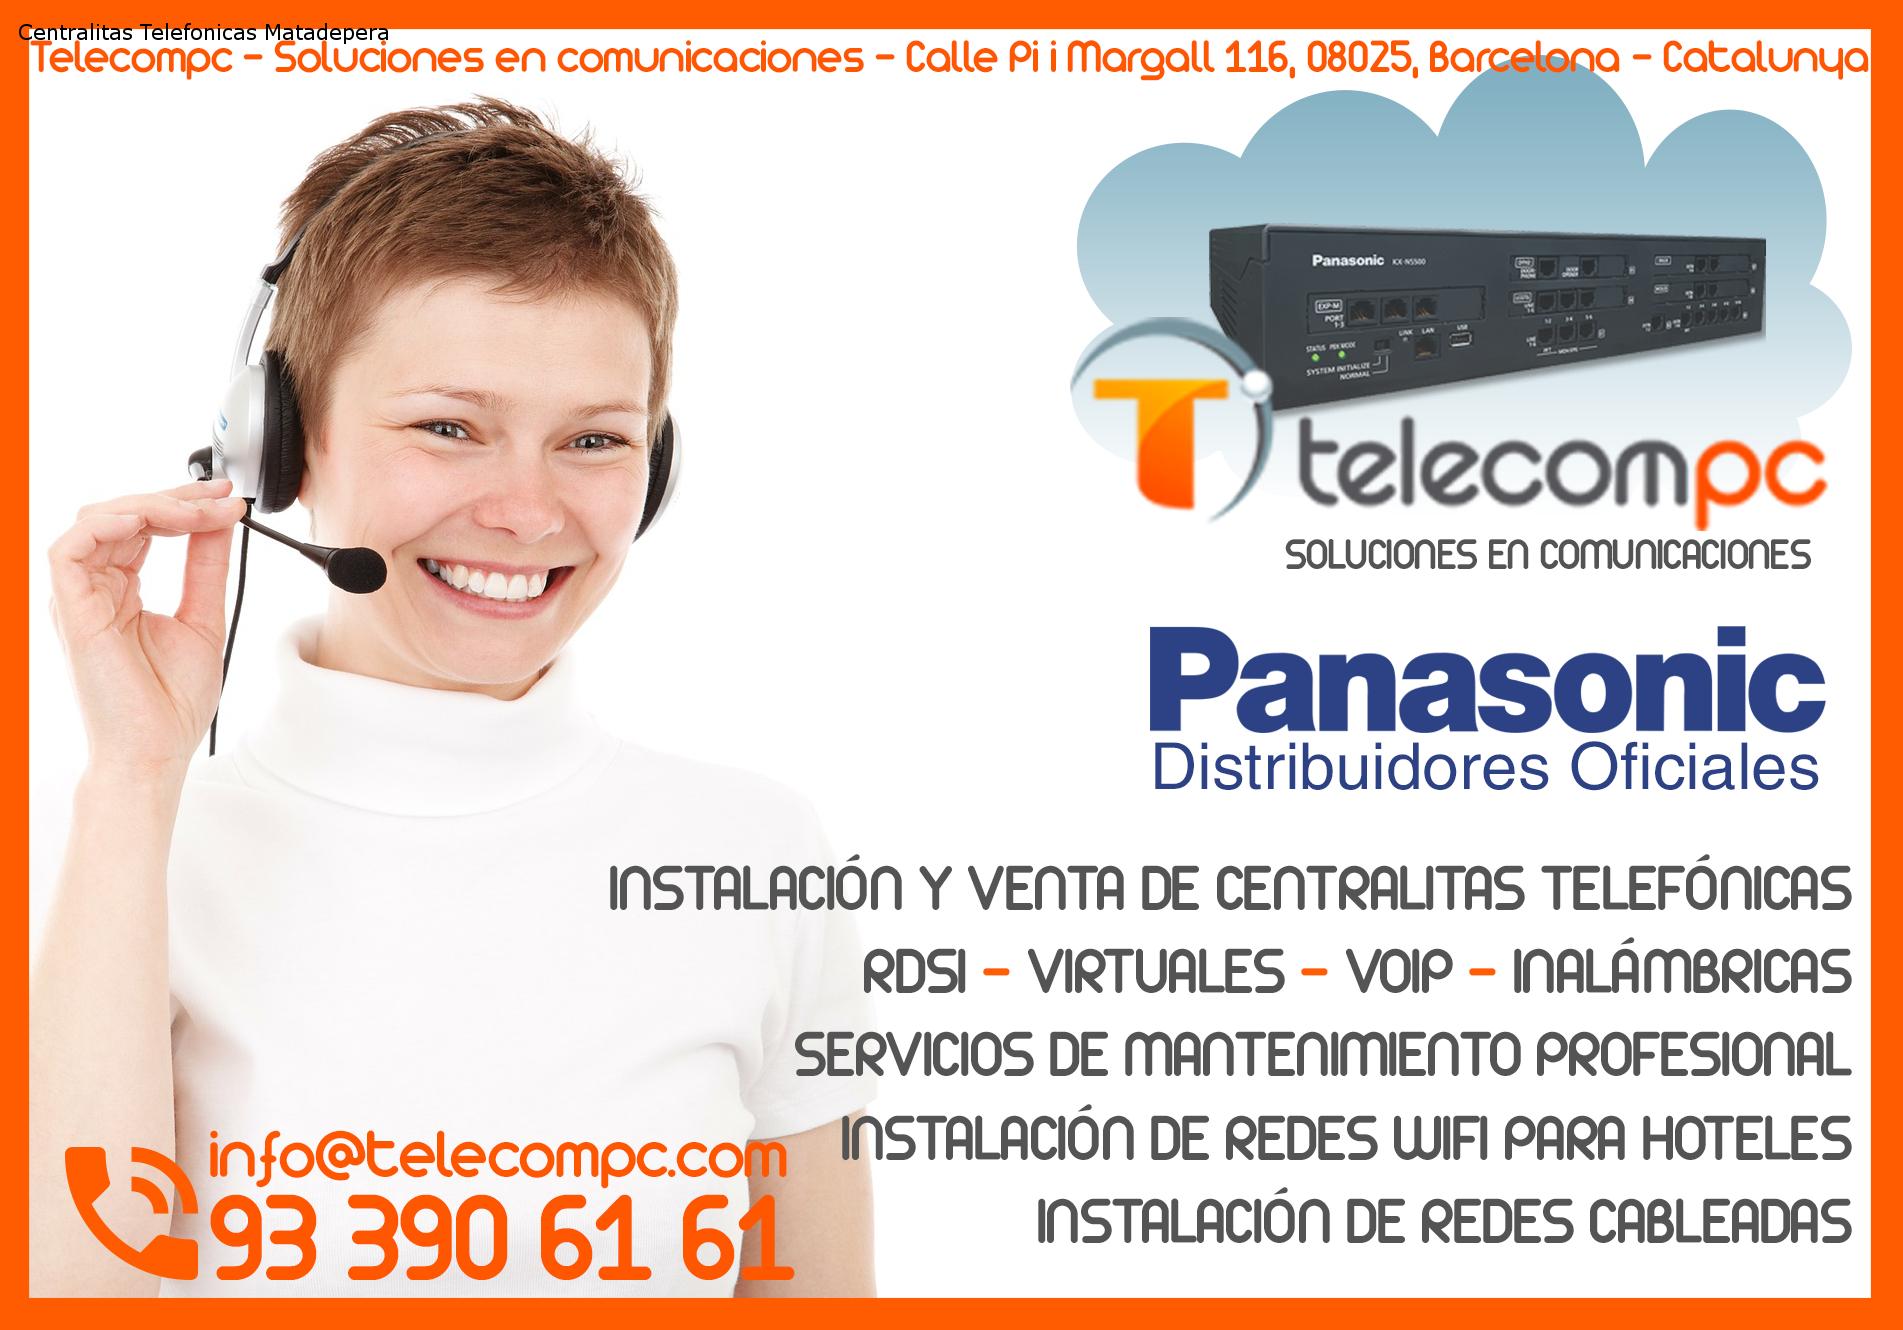 Centralitas Telefonicas Matadepera